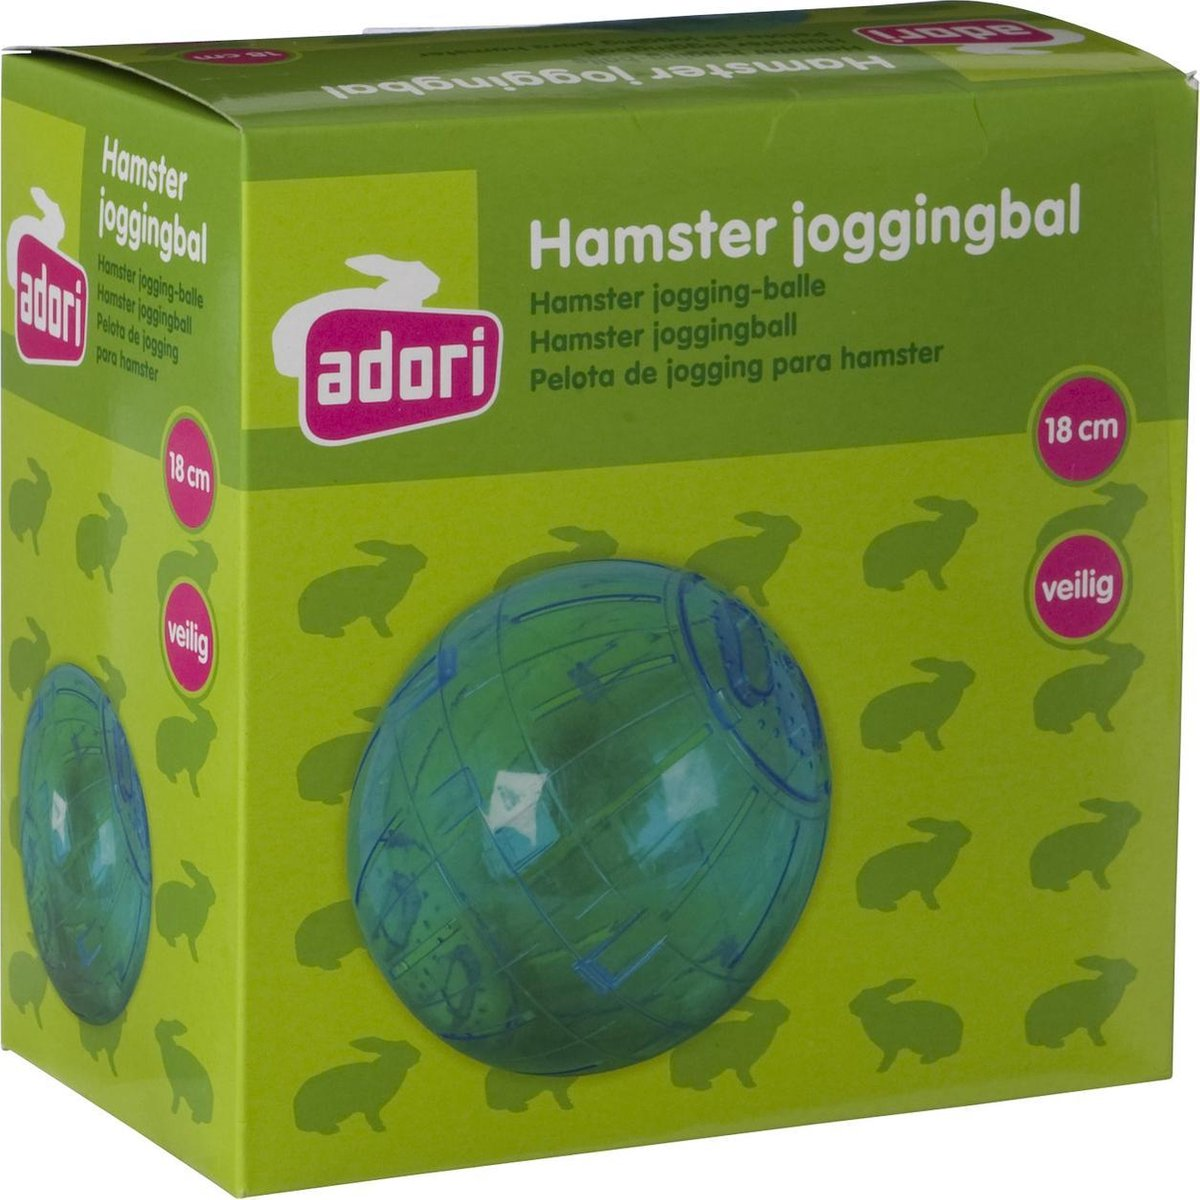 Adori Plastic Joggingbal Hamster - Adori